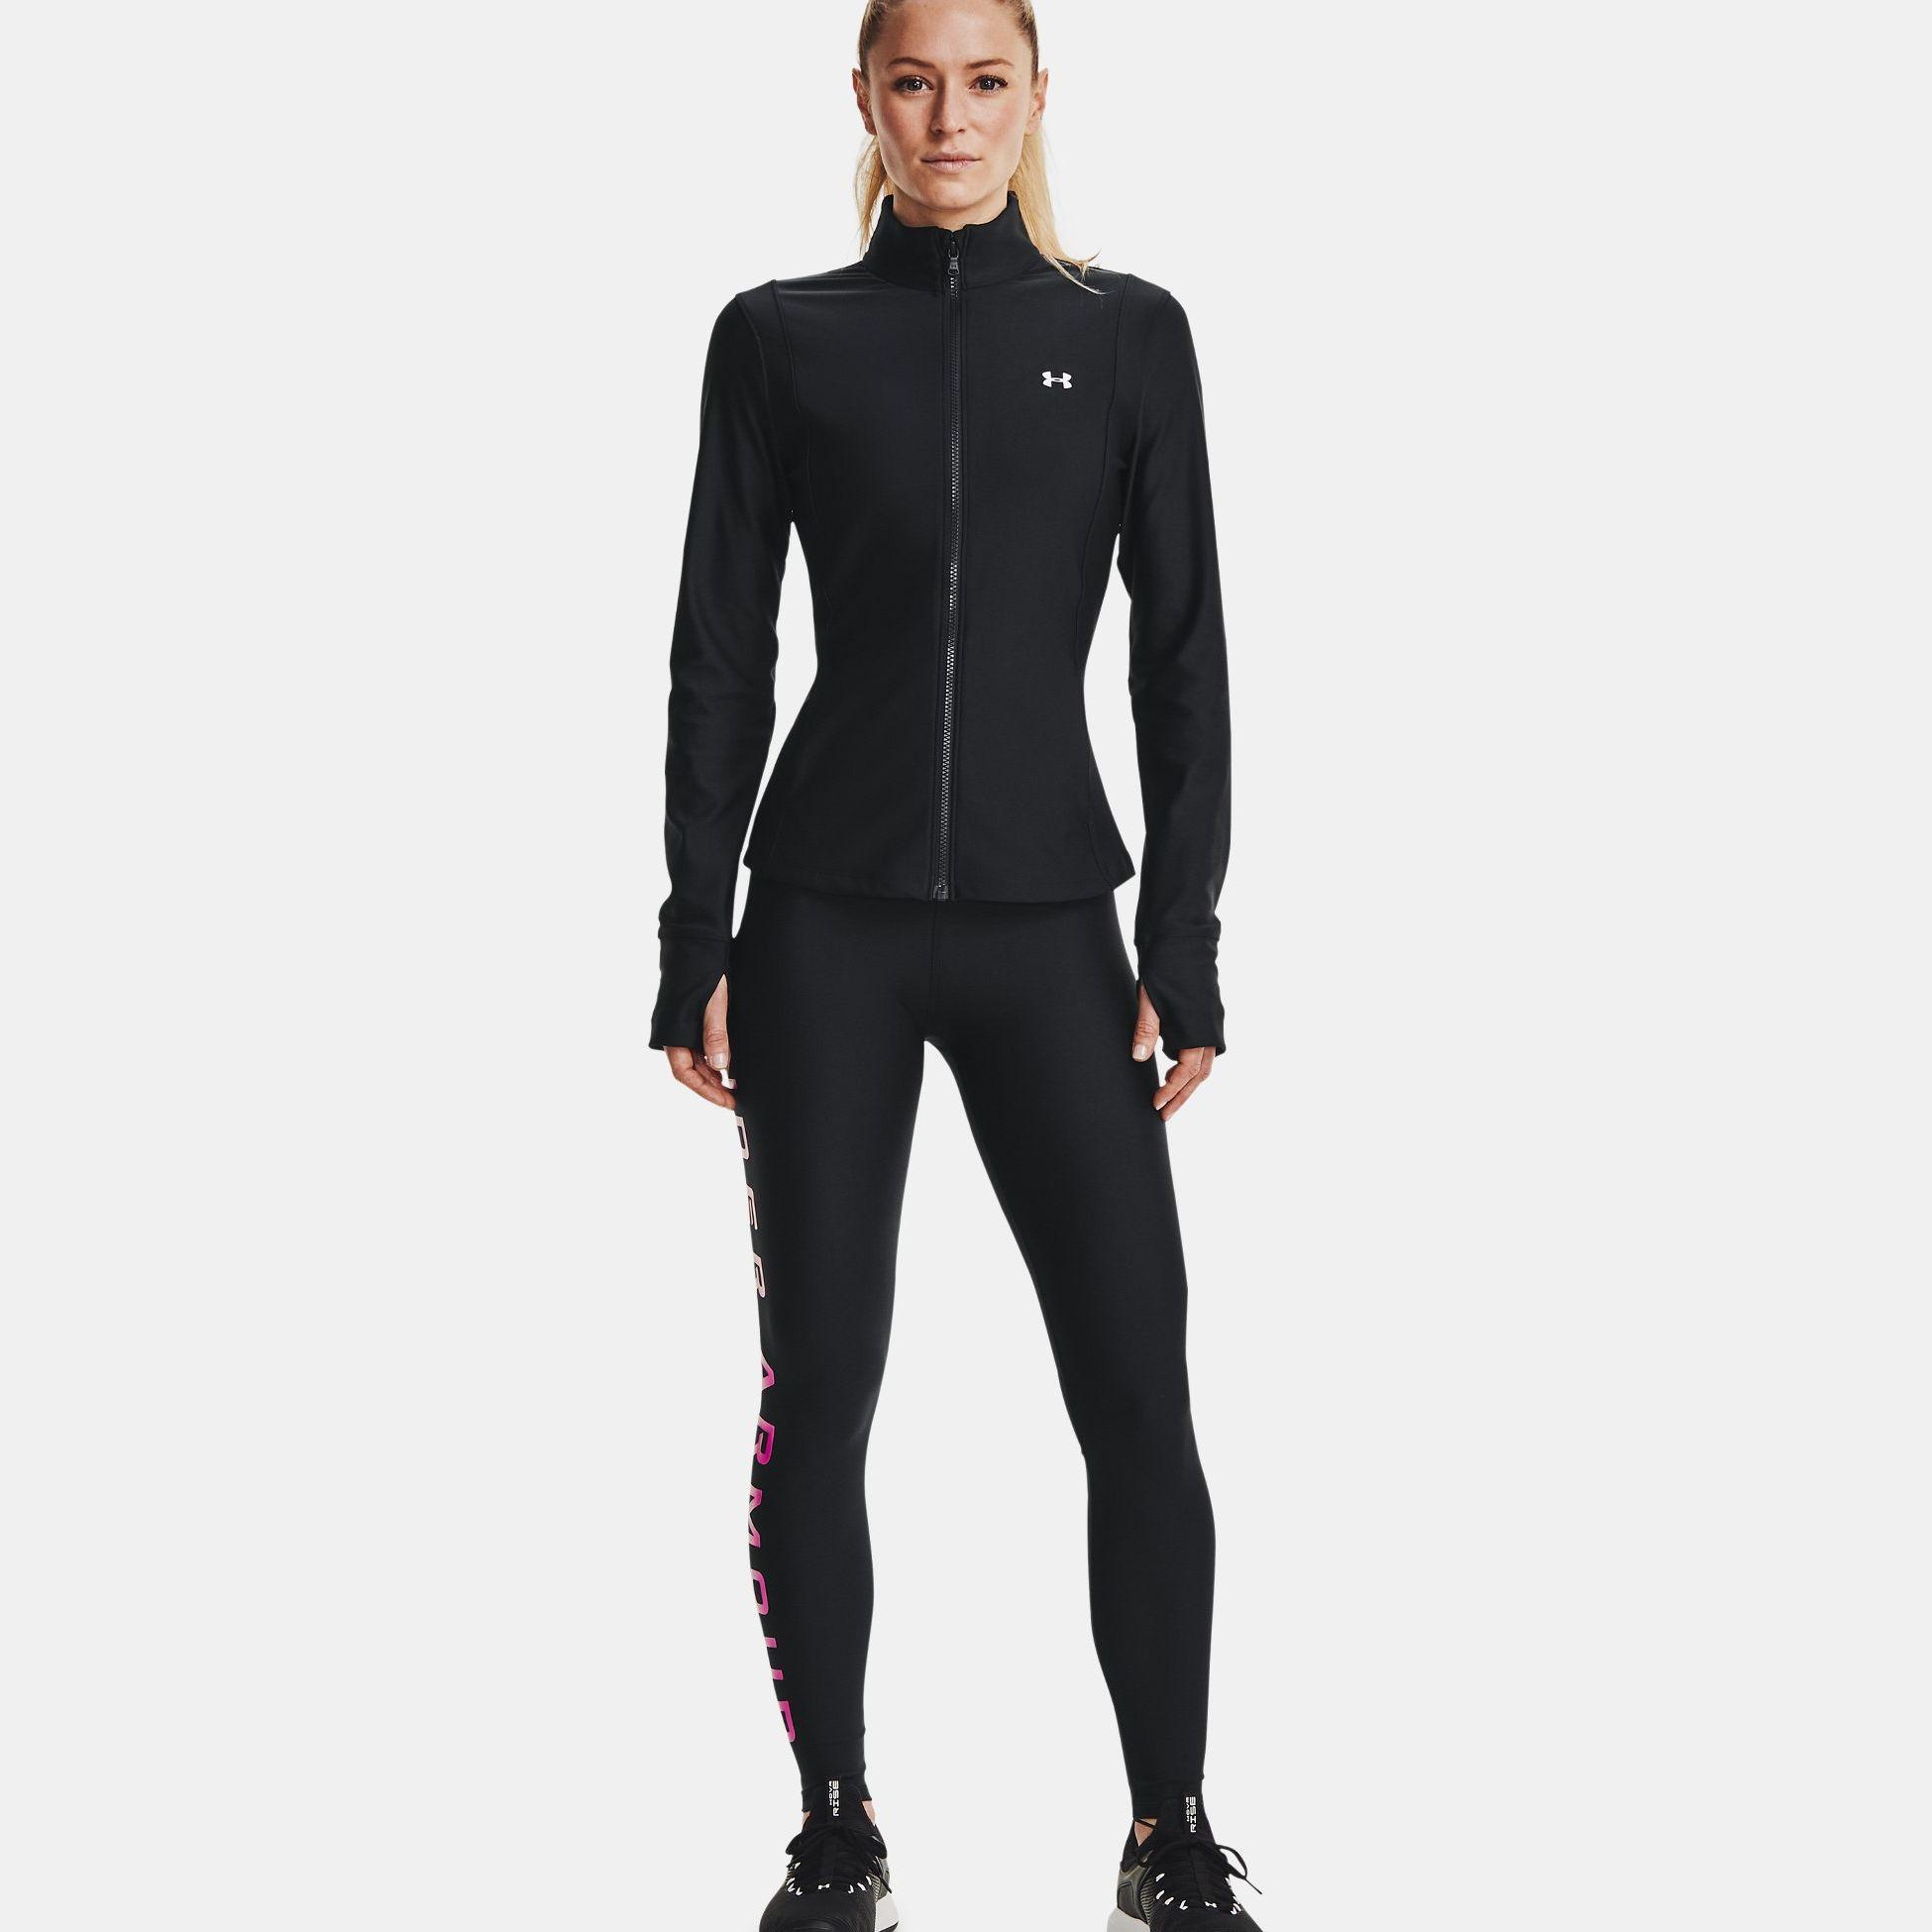 Îmbrăcăminte -  under armour HG Armour No-Slip Waistband Branded Leggings 1046